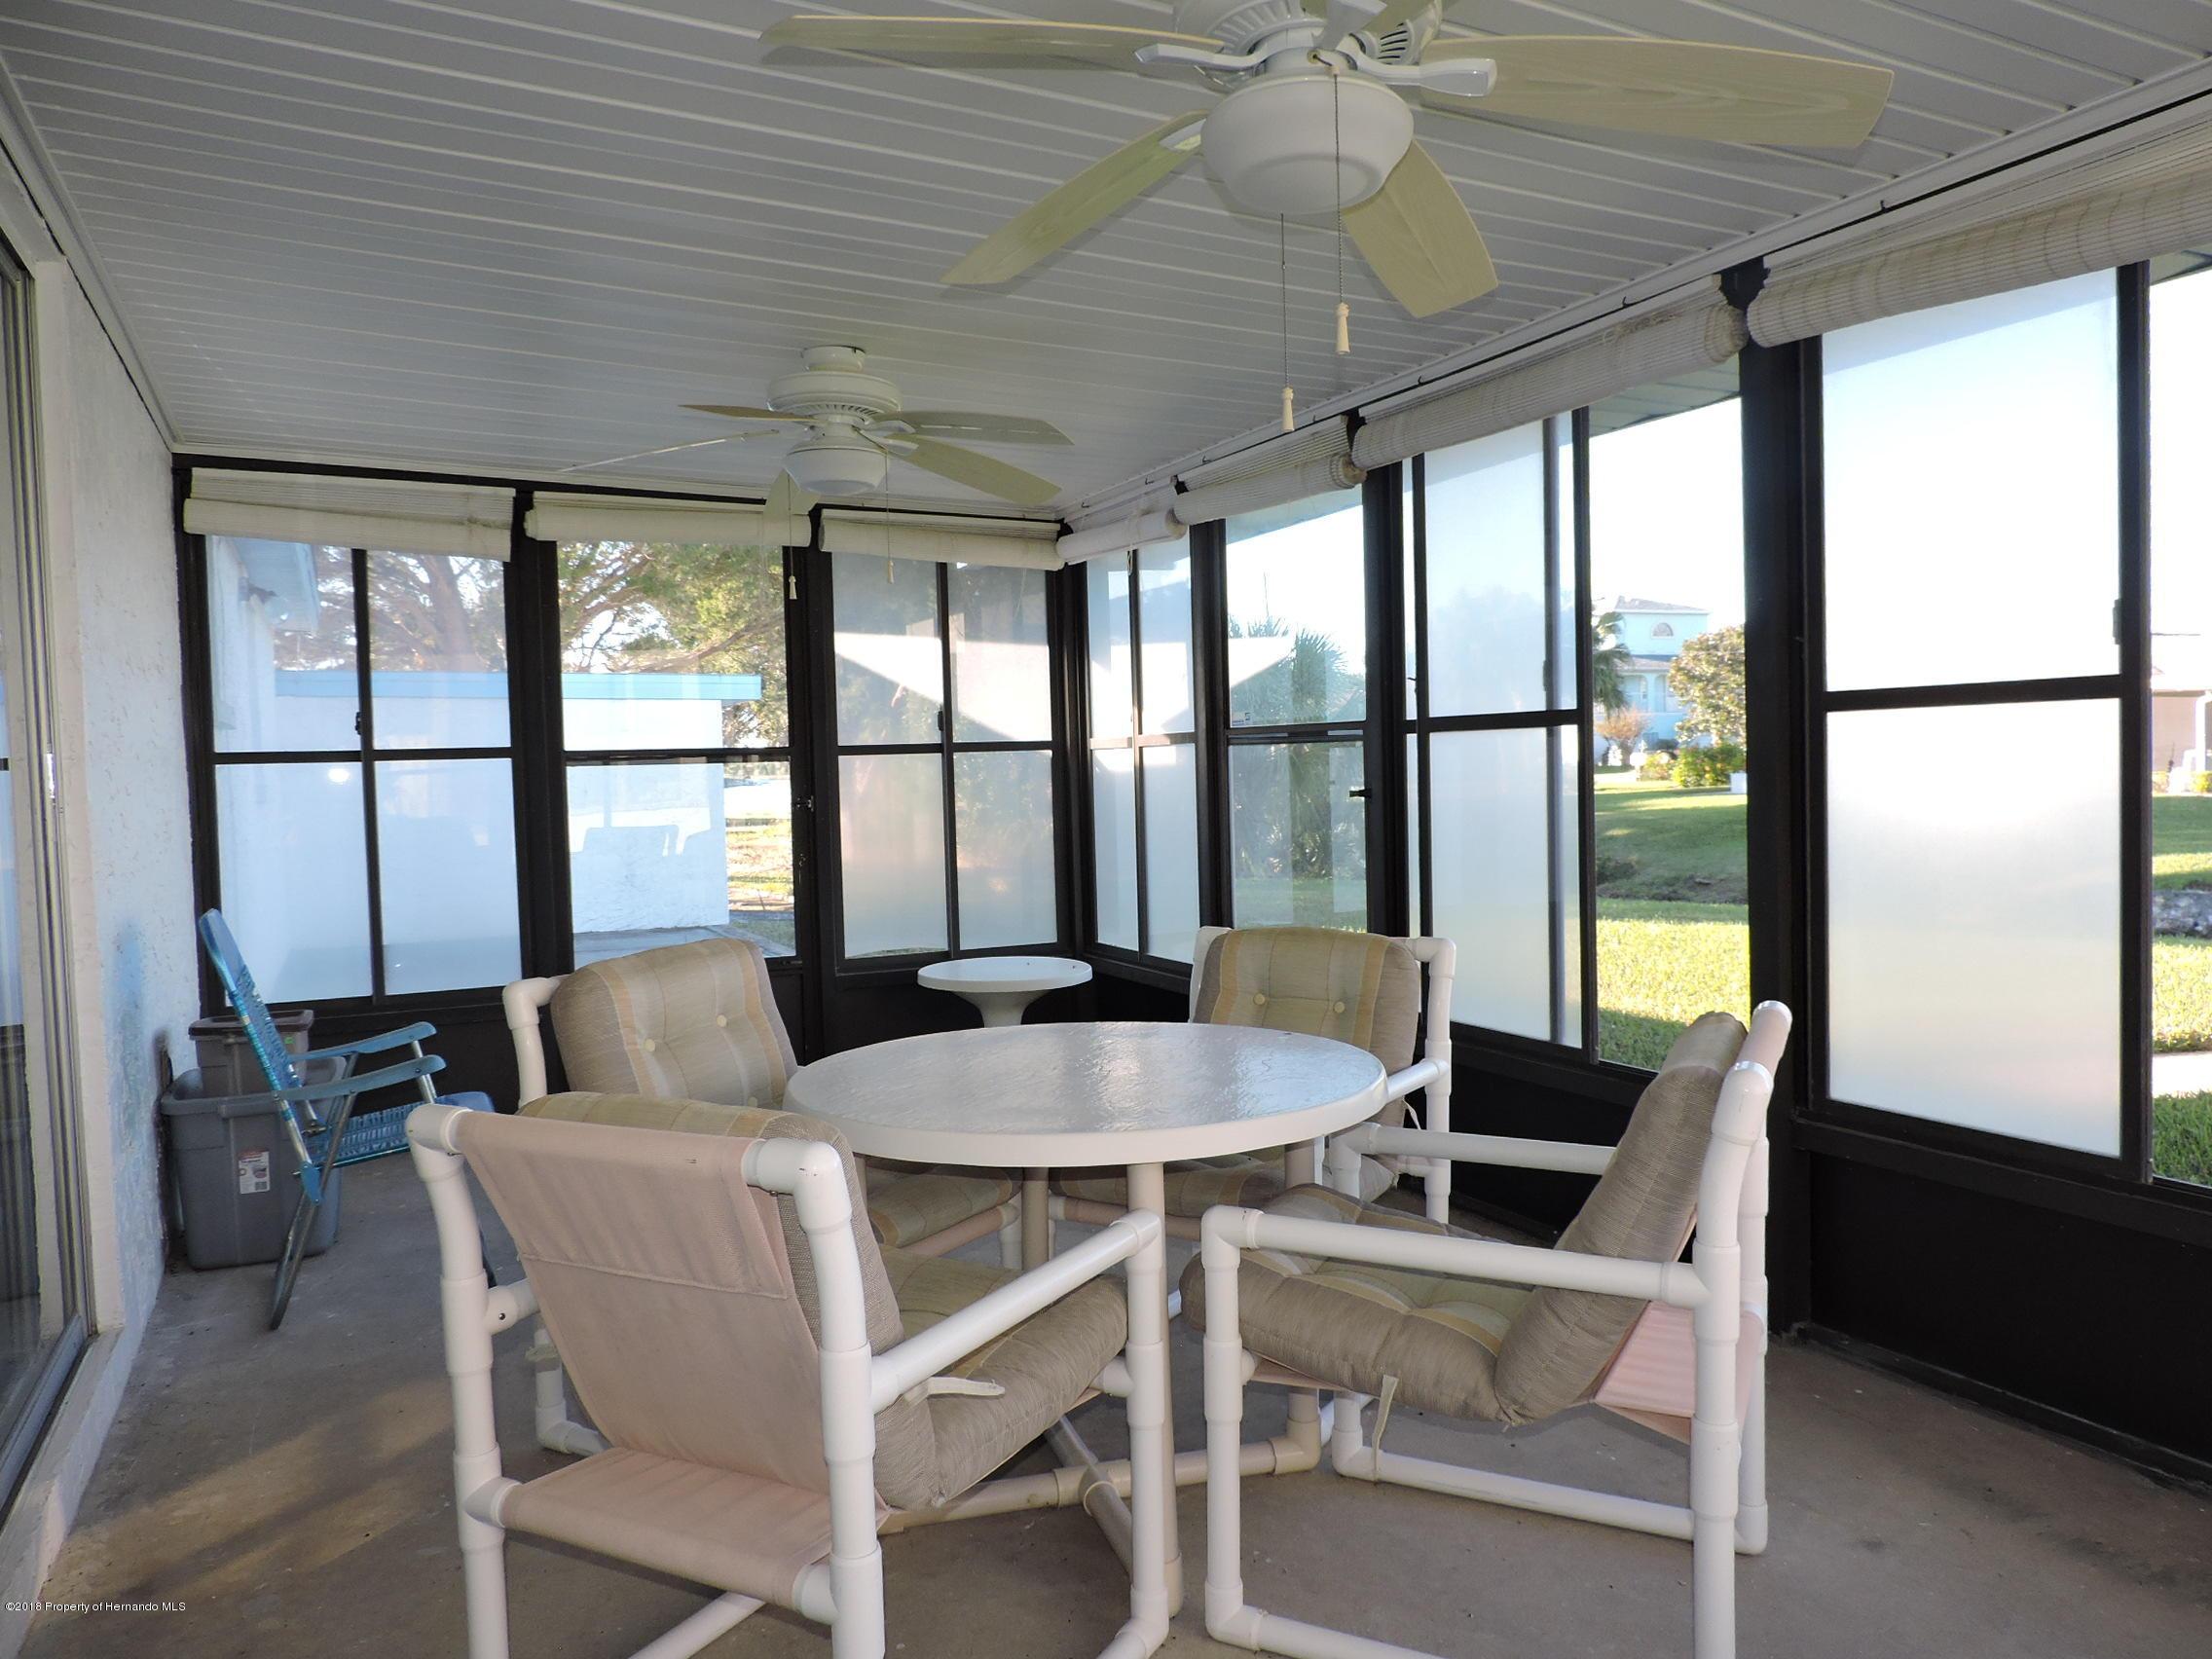 3257 Gardenia Drive, Hernando Beach, Florida 34607, 2 Bedrooms Bedrooms, ,2 BathroomsBathrooms,Residential,For Sale,Gardenia,2197348